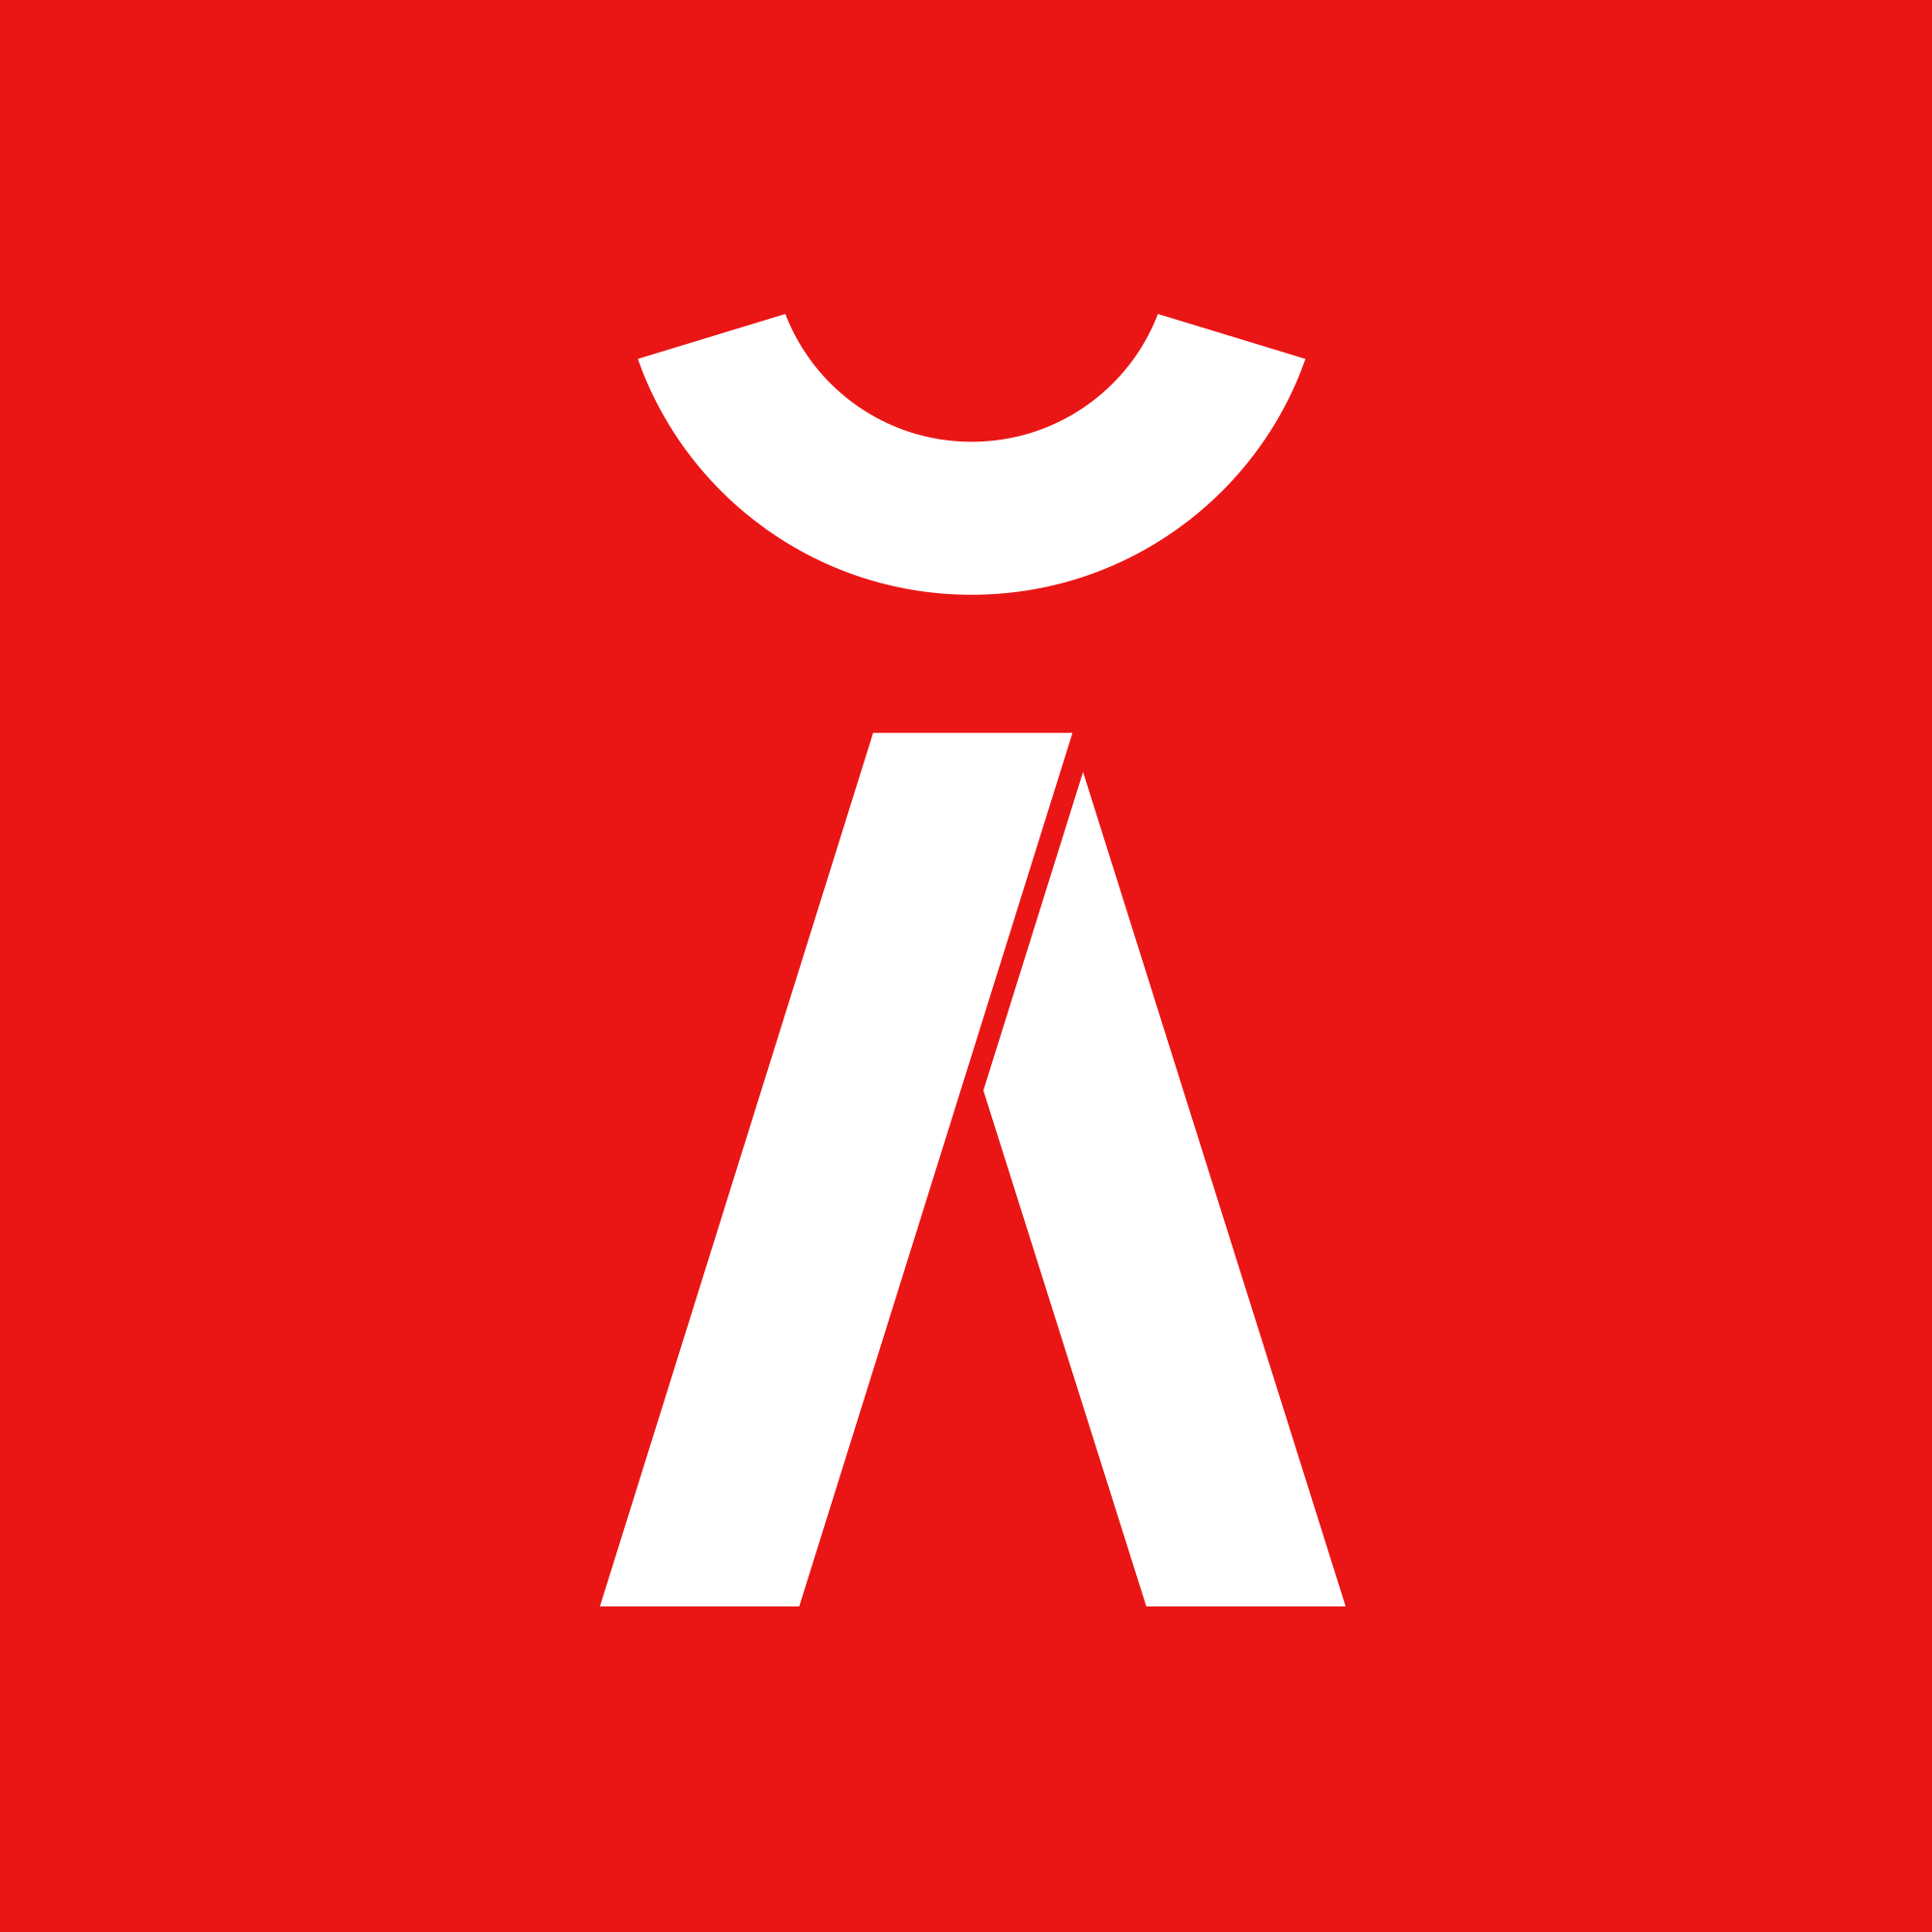 andreas_weiland_aarhus_art